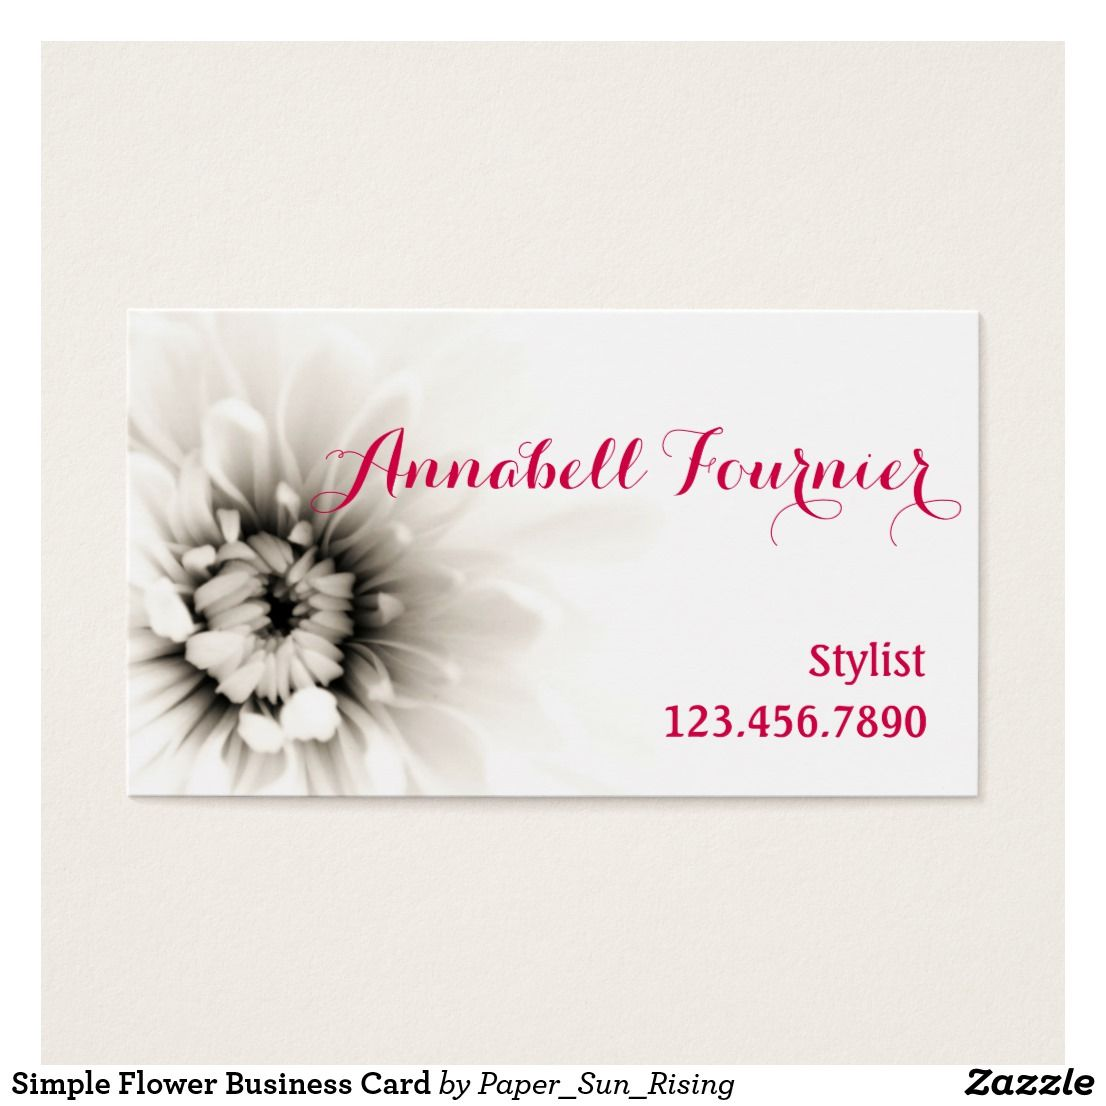 Simple Flower Business Card | Pinterest